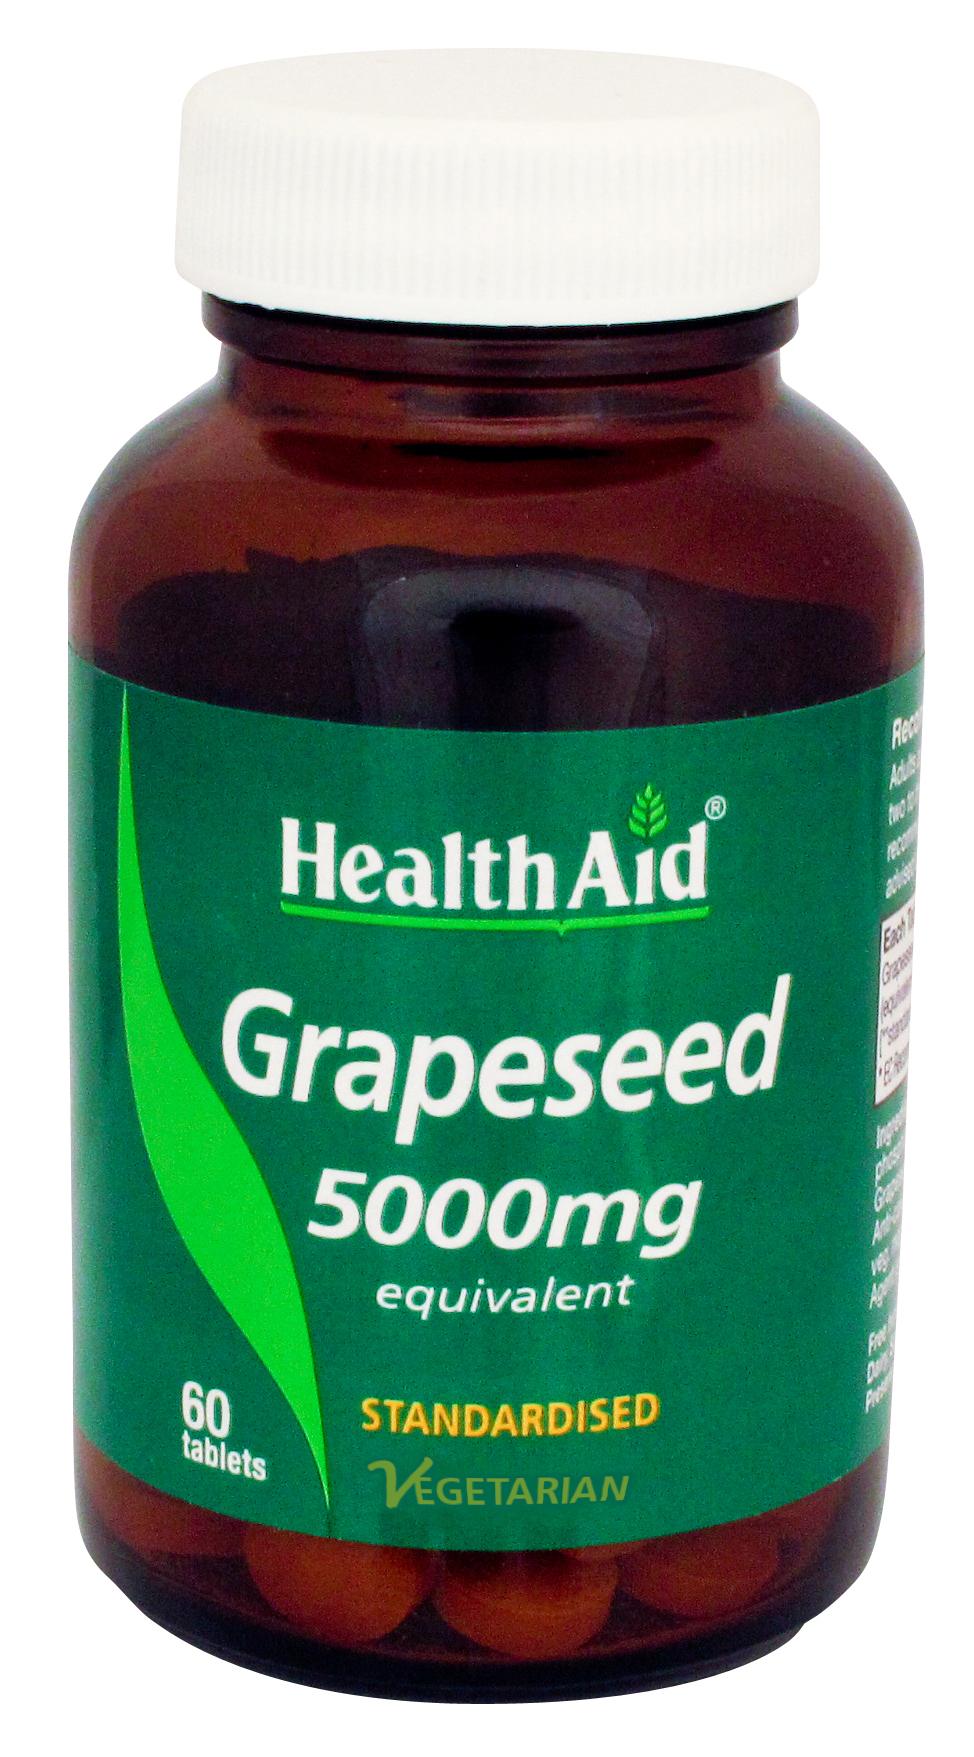 Grapeseed 5000mg 60's